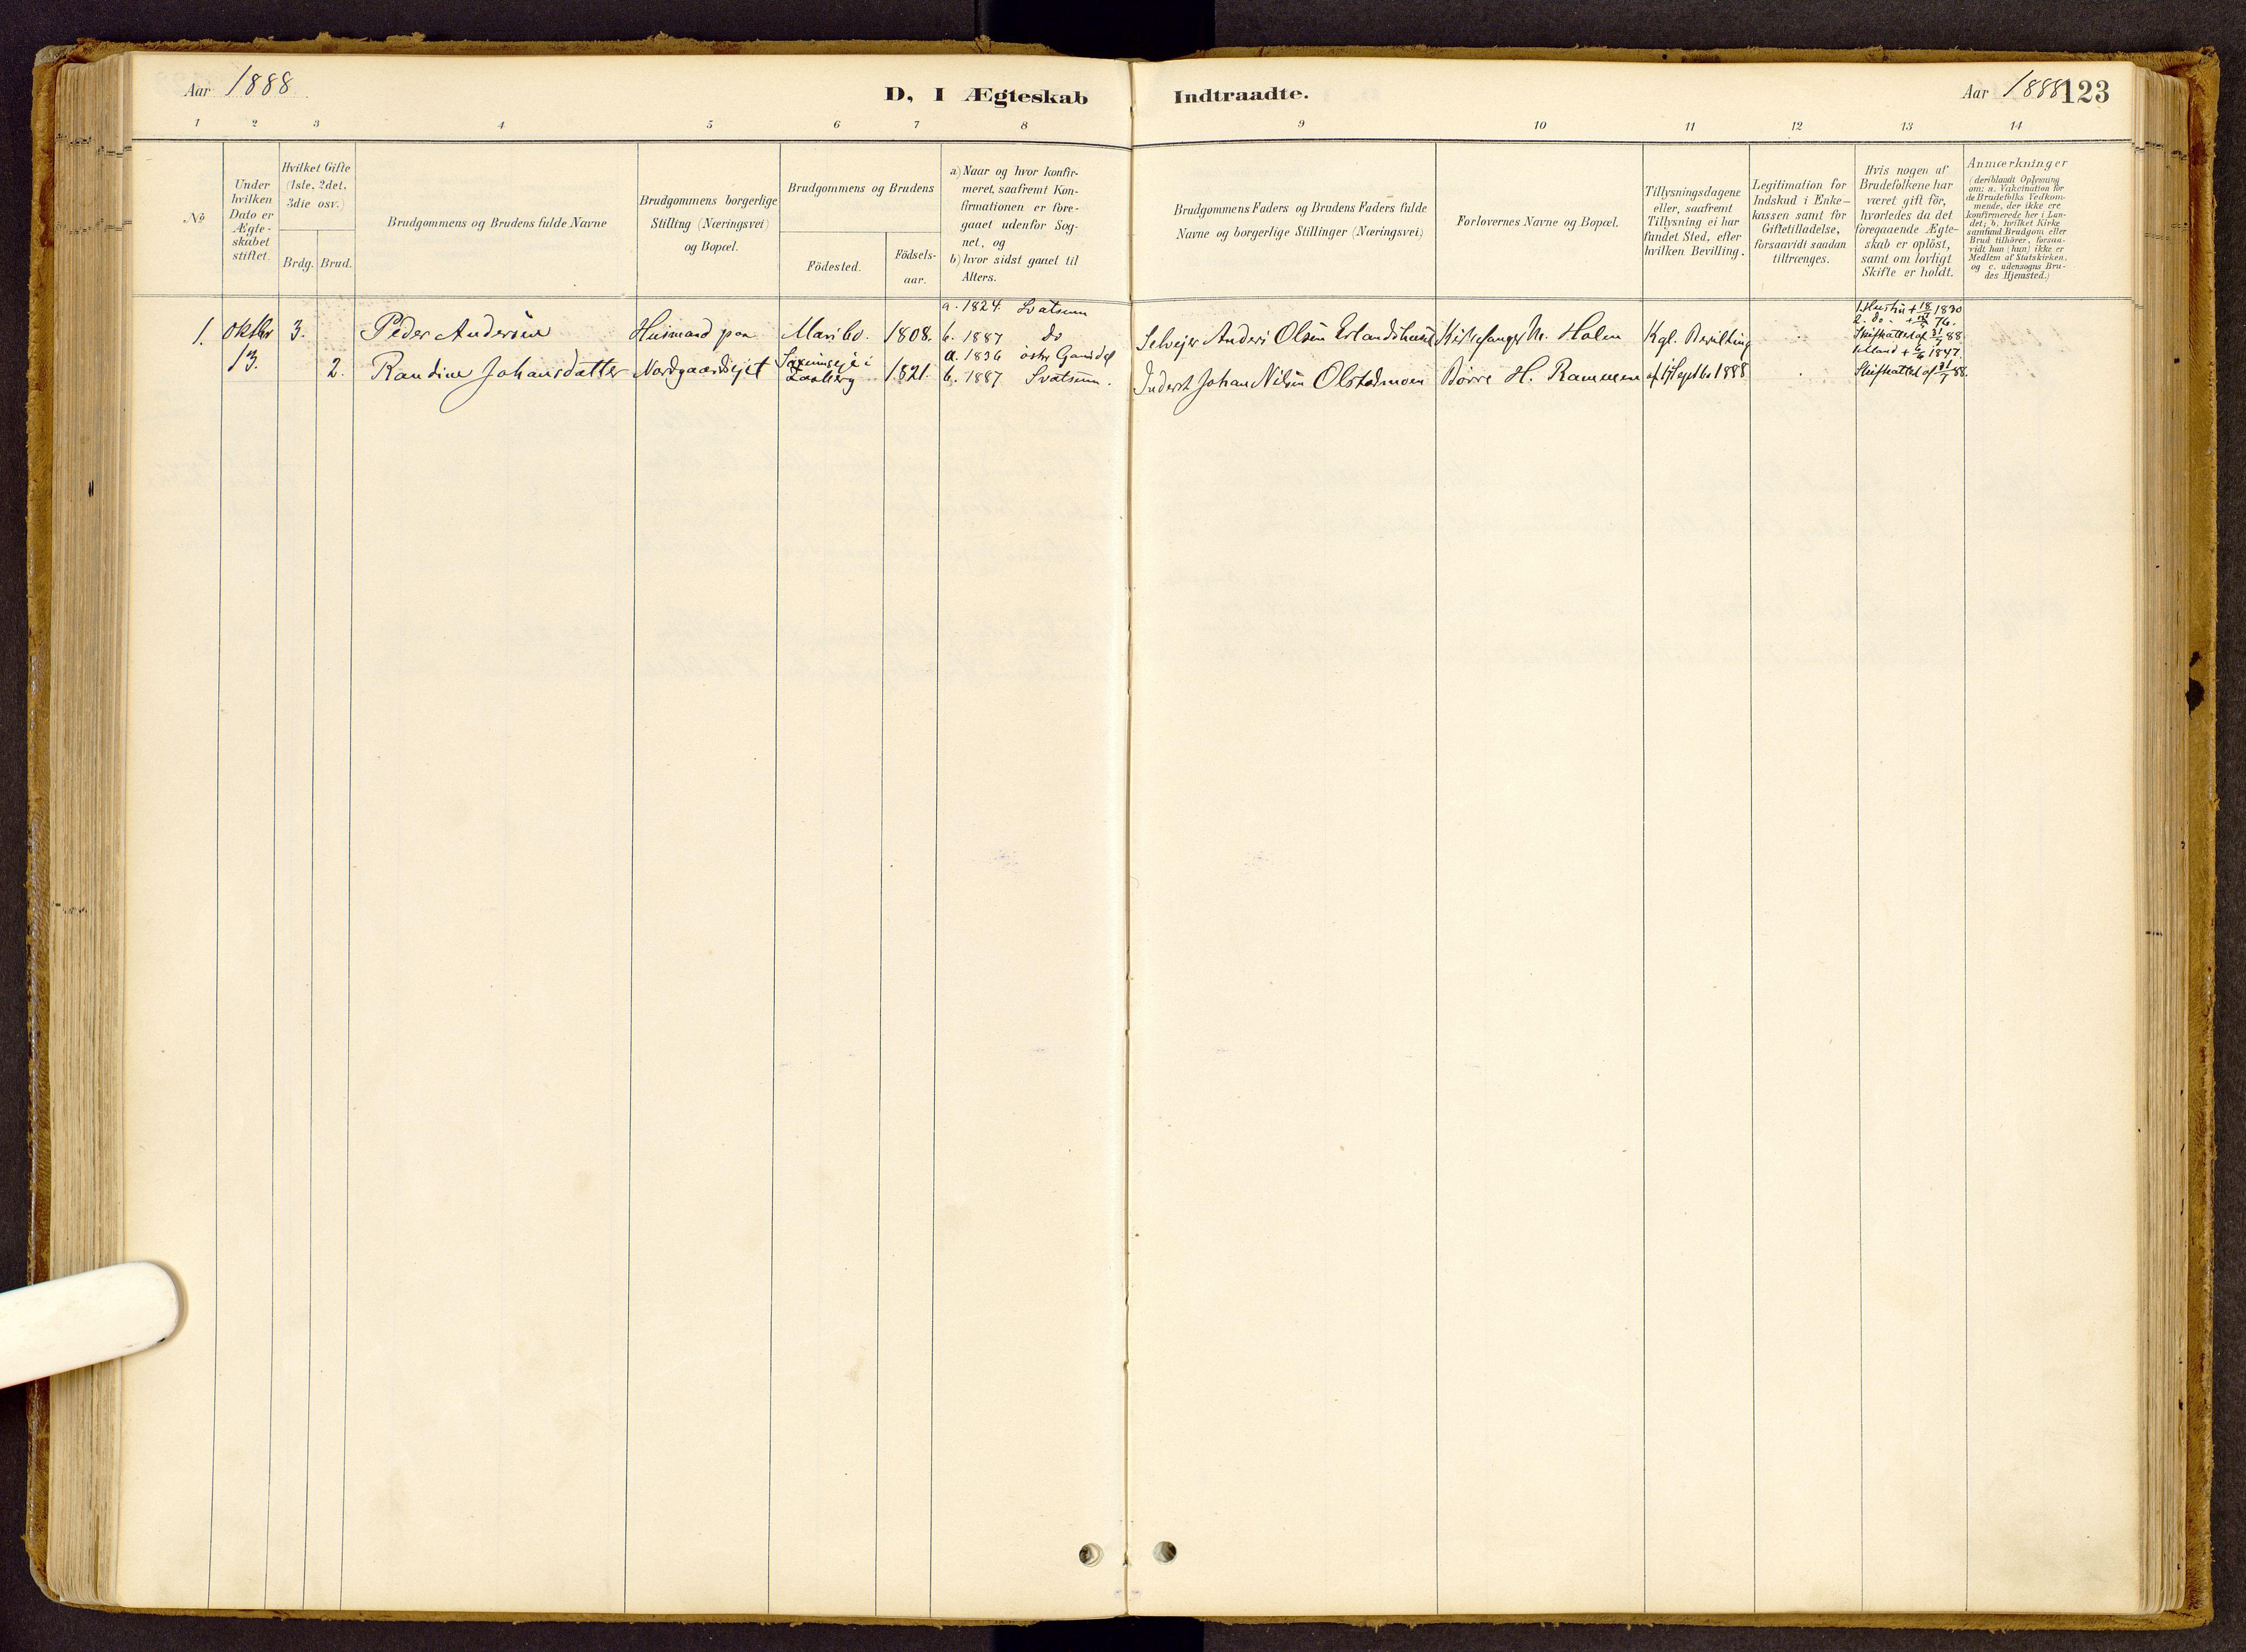 SAH, Vestre Gausdal prestekontor, Ministerialbok nr. 2, 1887-1918, s. 123